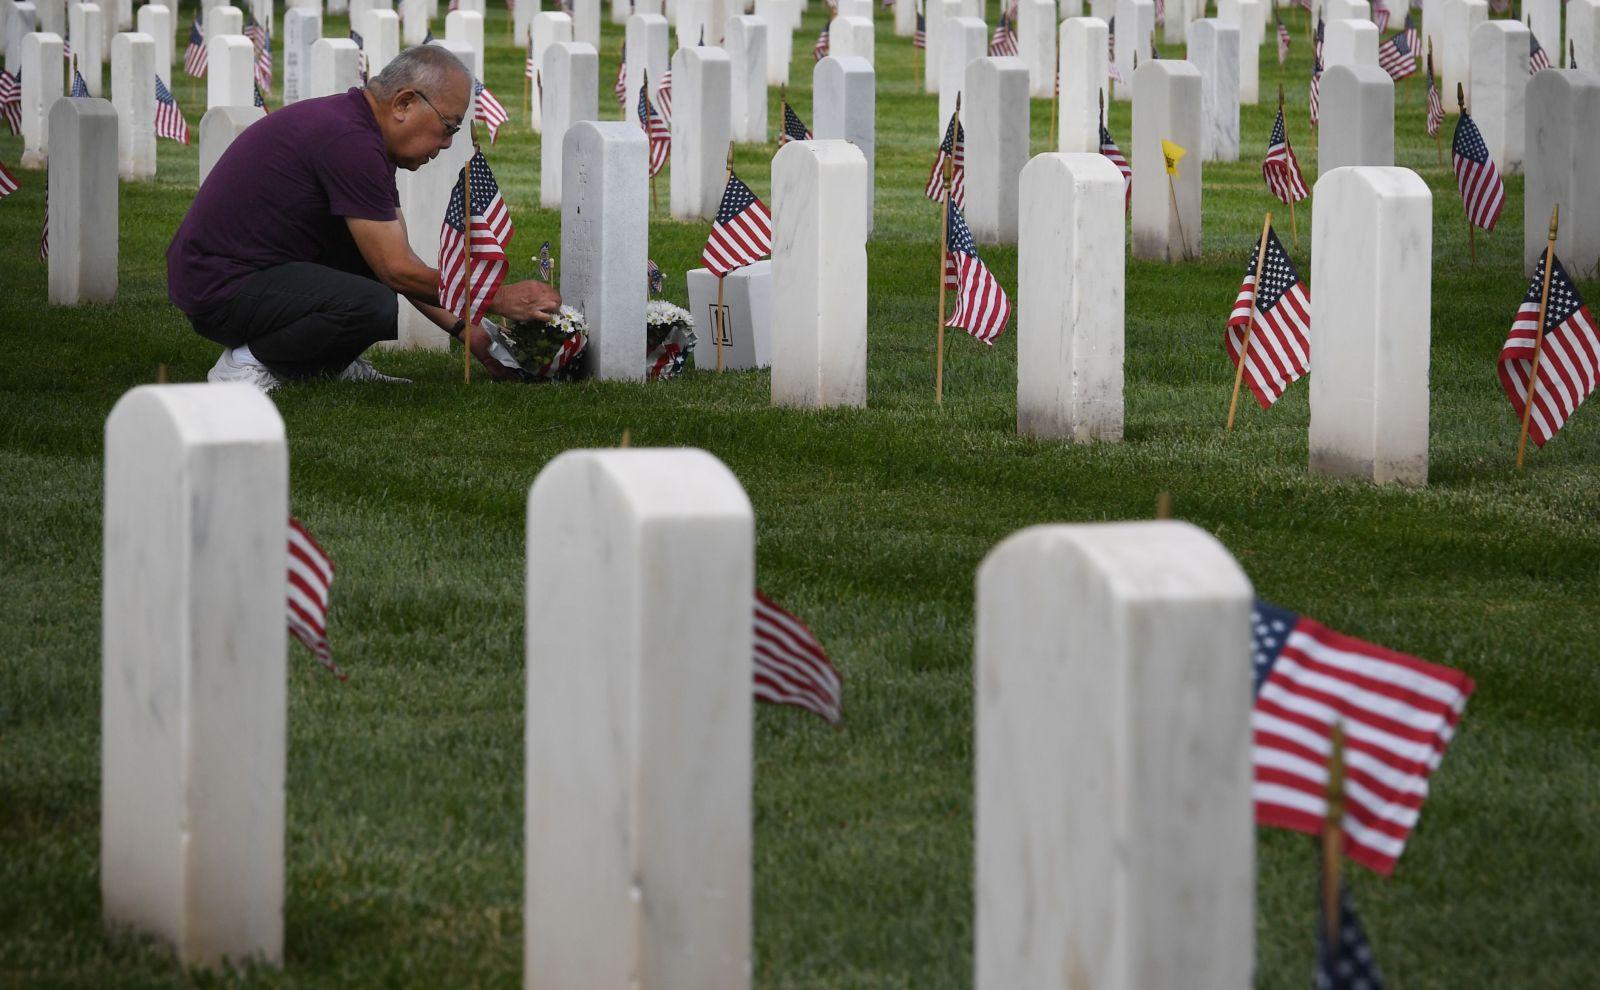 In photos: Memorial Day weekend